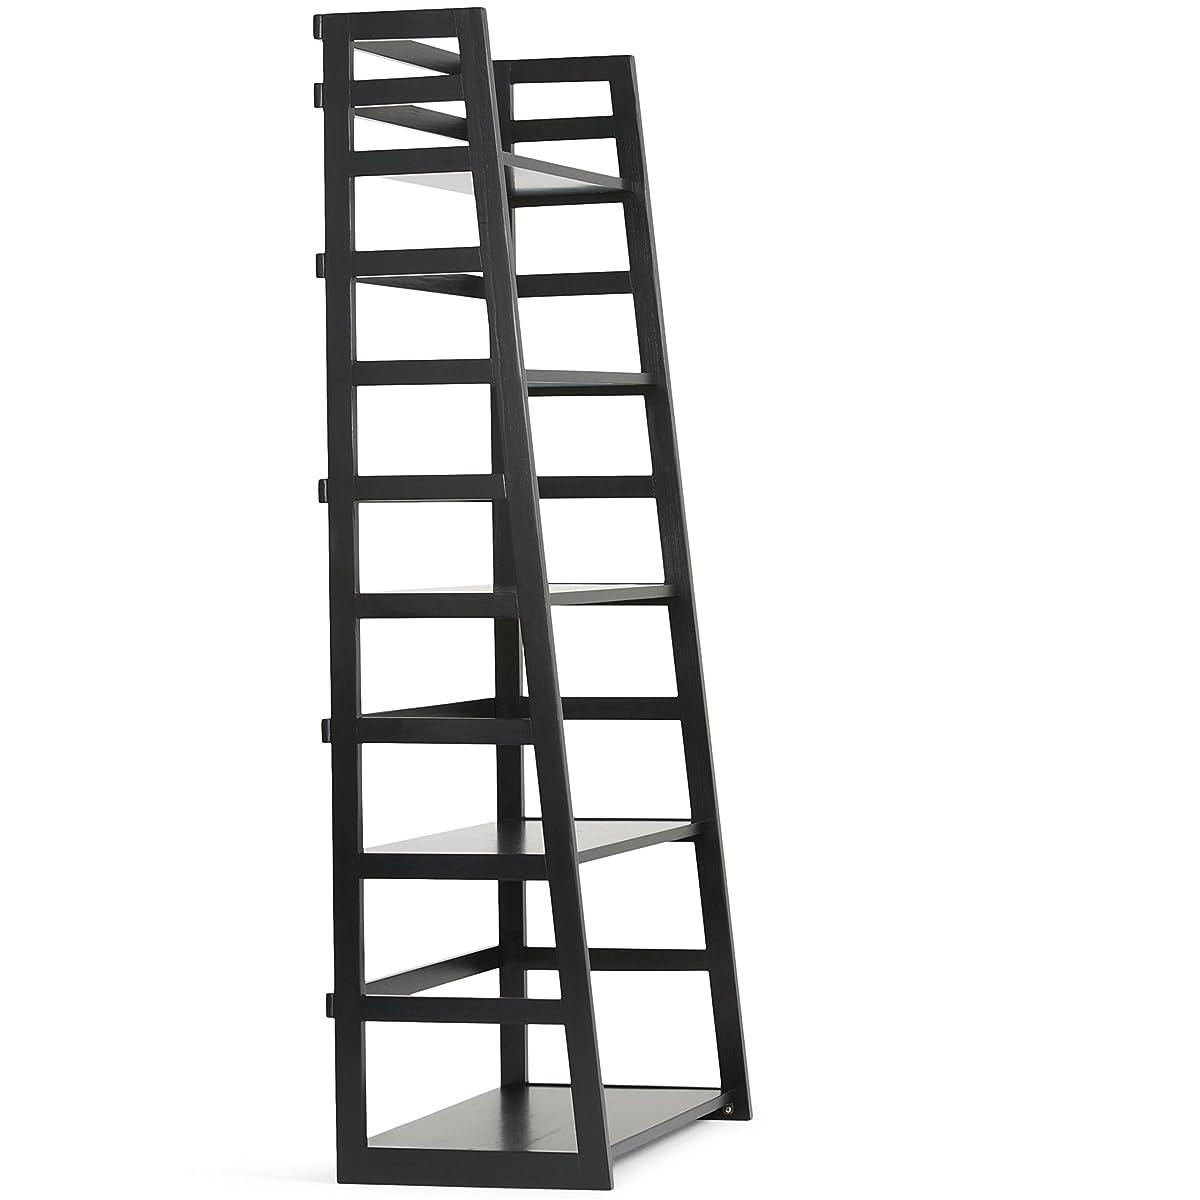 Simpli Home Acadian Solid Wood Ladder Shelf Bookcase, Black